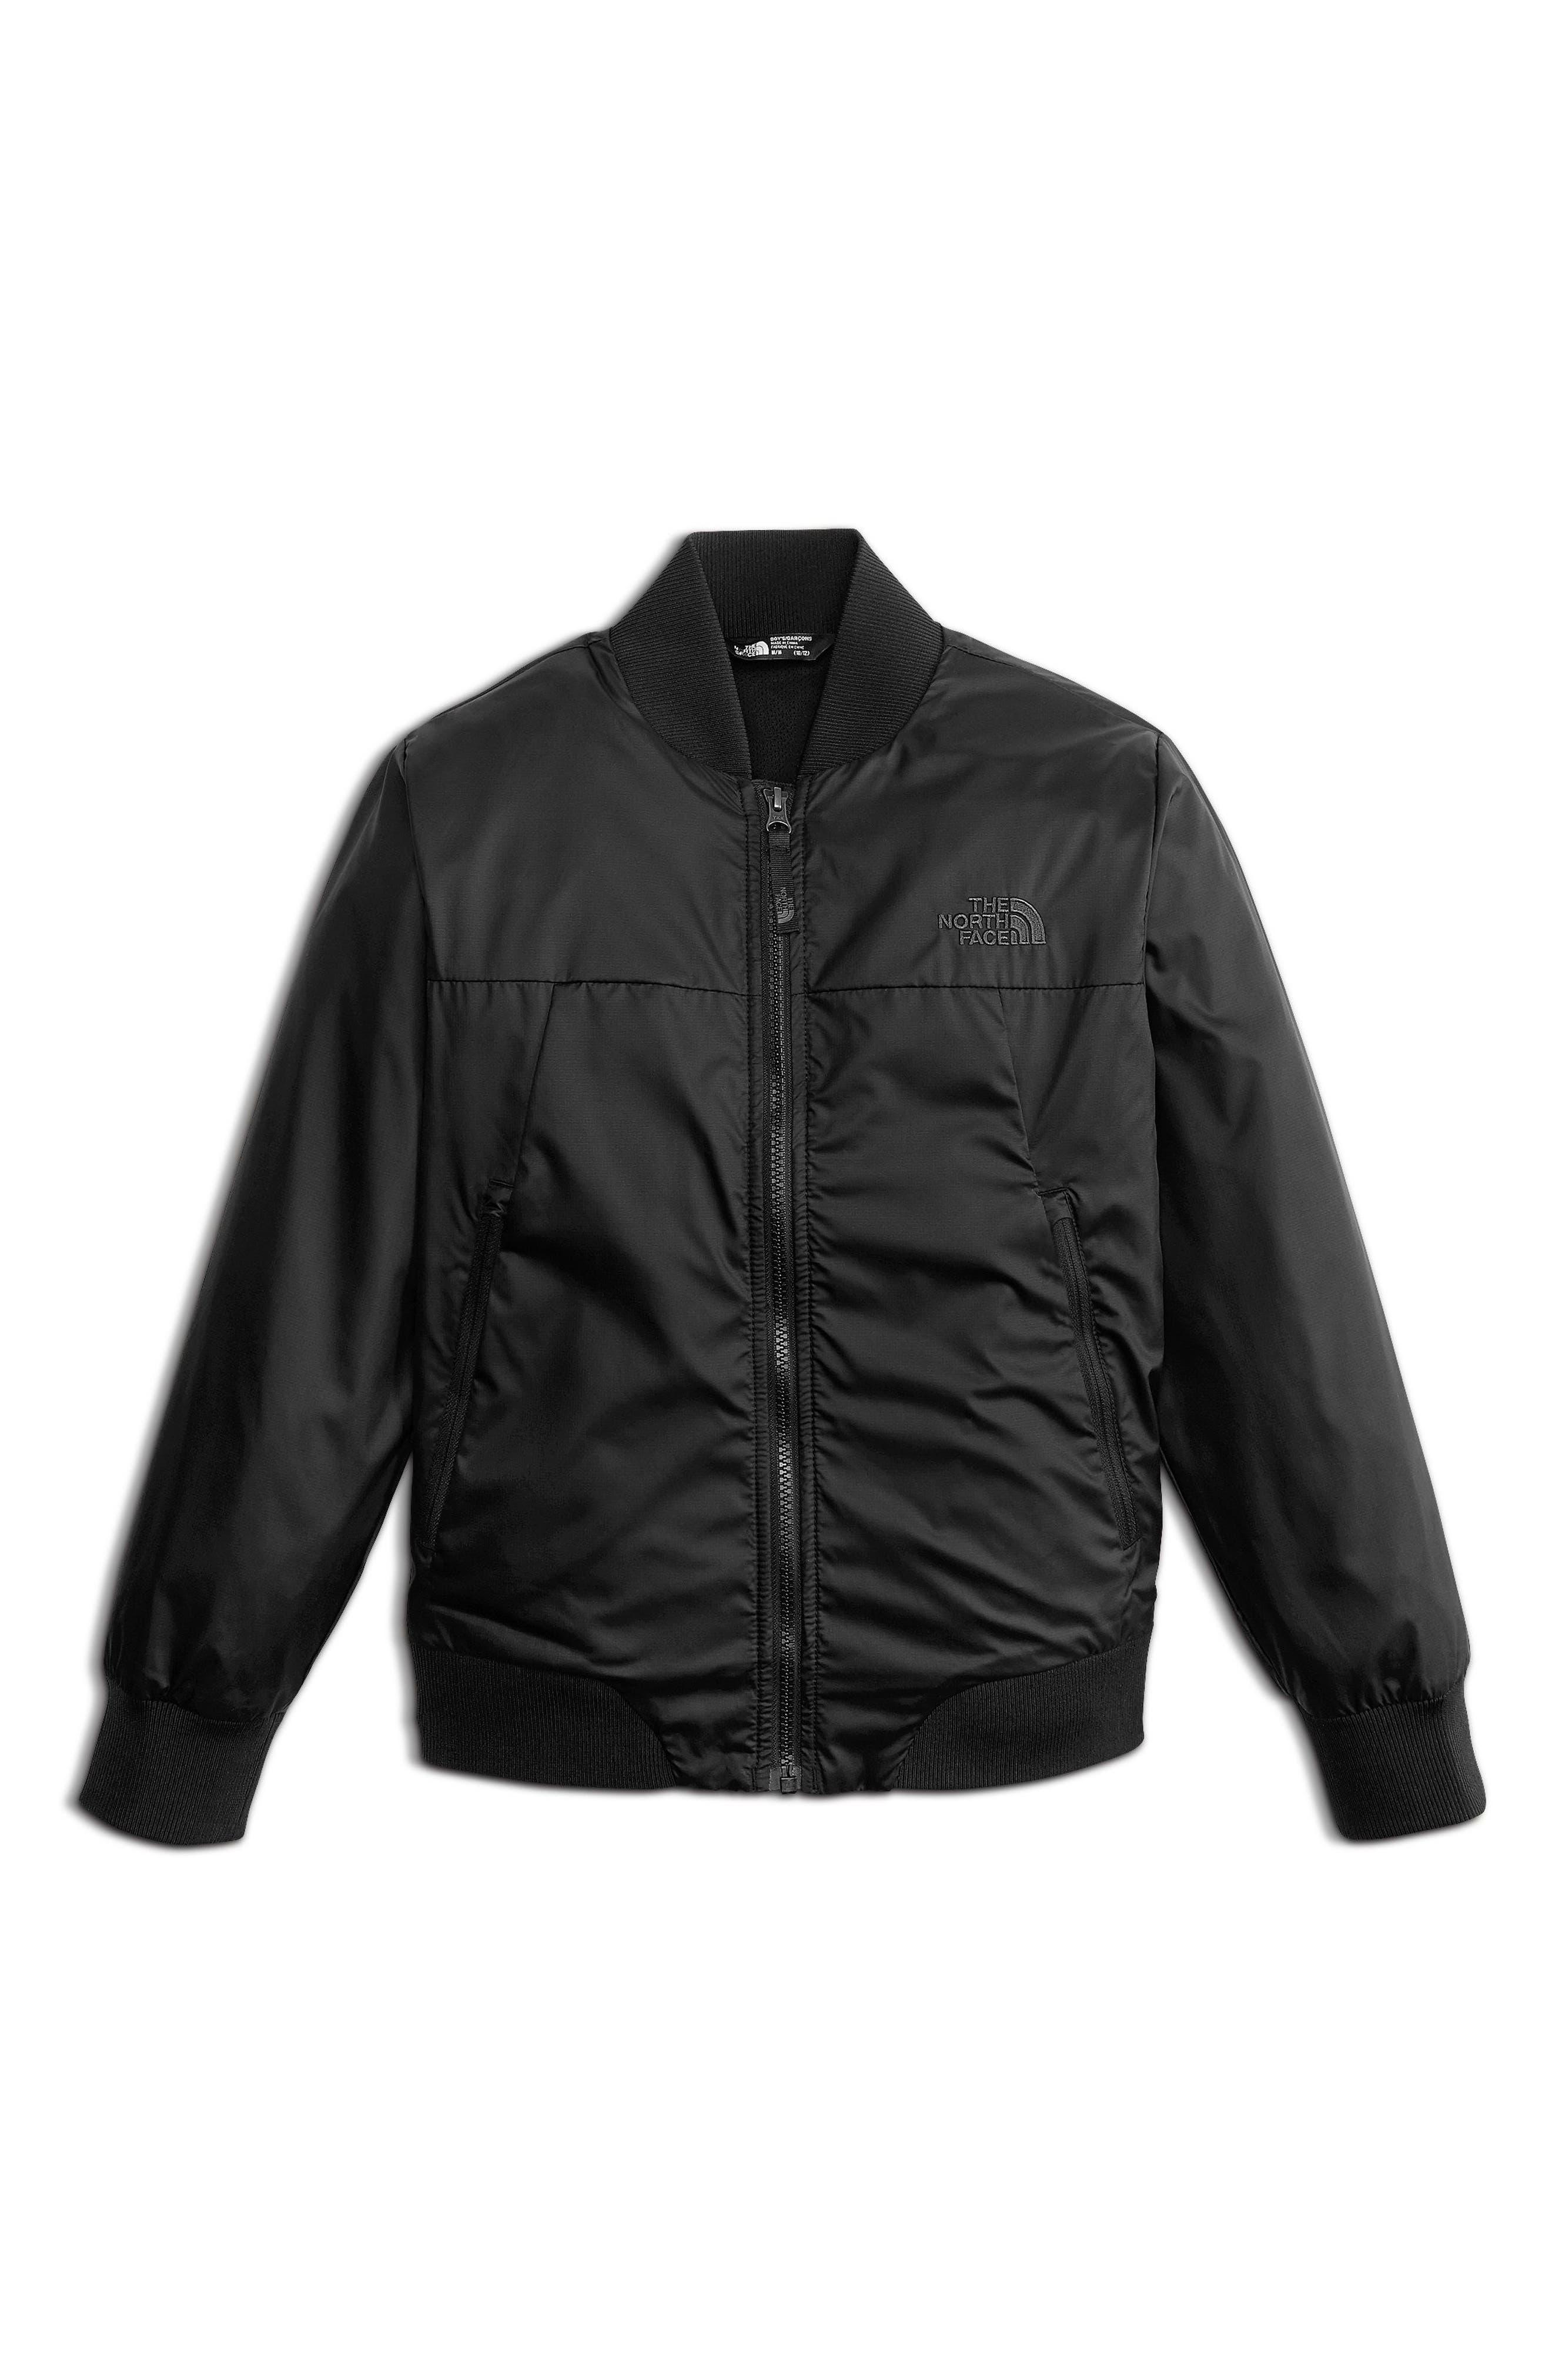 Flurry Windproof Bomber Jacket,                         Main,                         color, Tnf Black